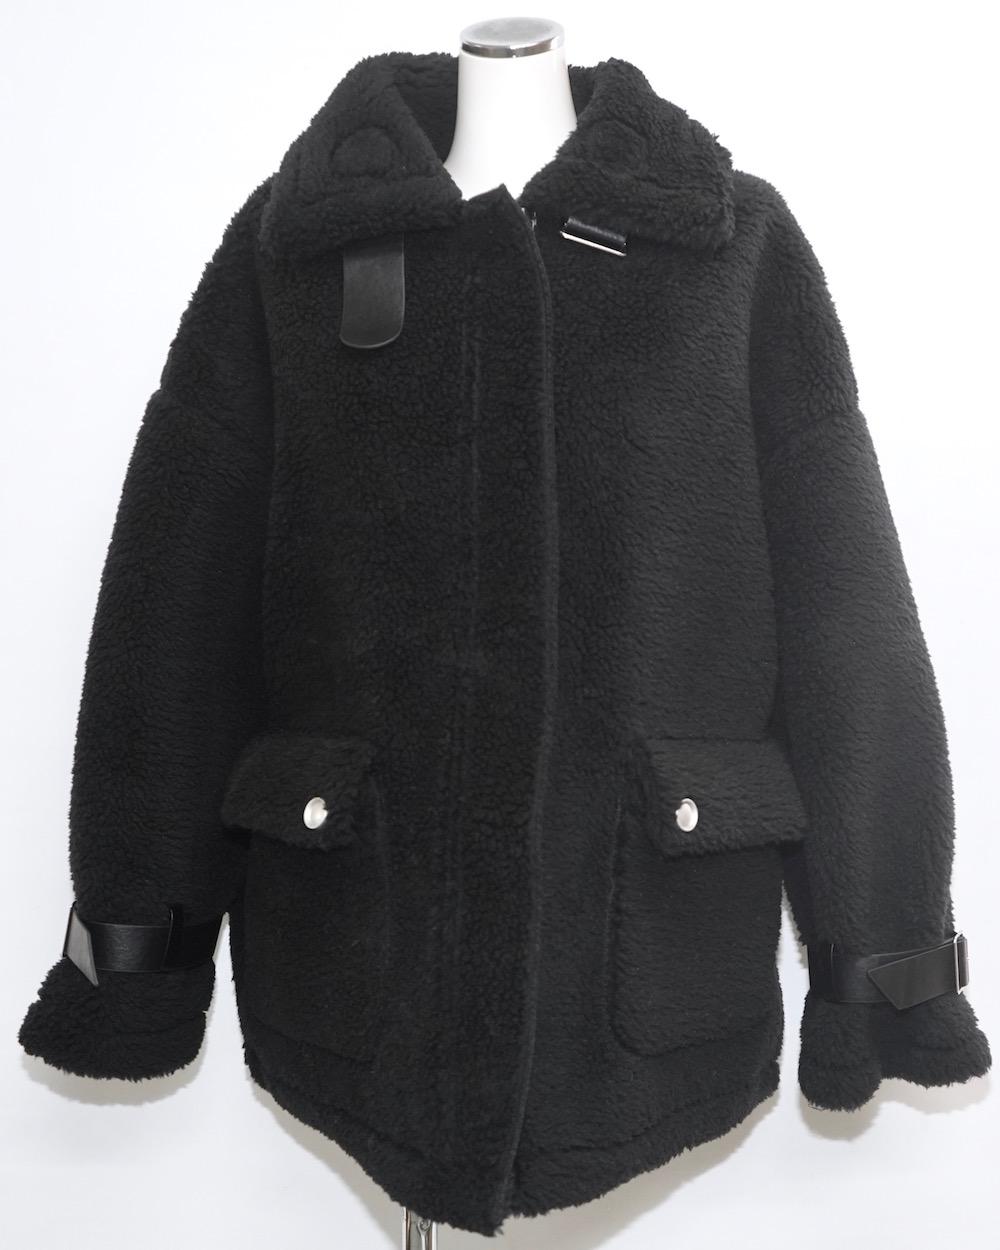 All Boa B-3 Big Jacket (black)